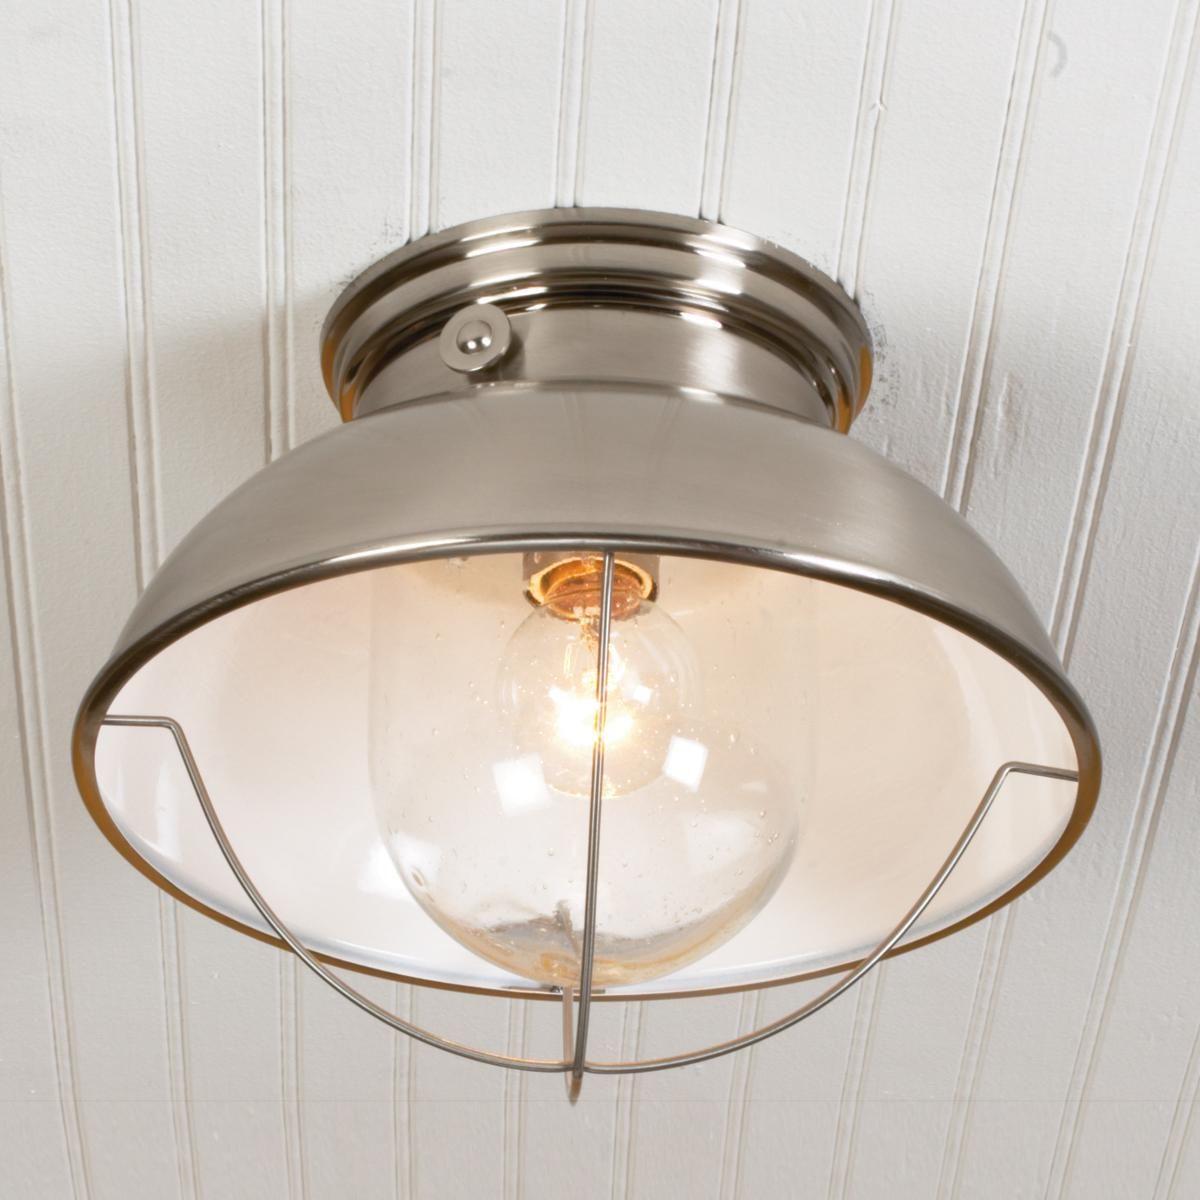 Nautical Ceiling Light Fixtures